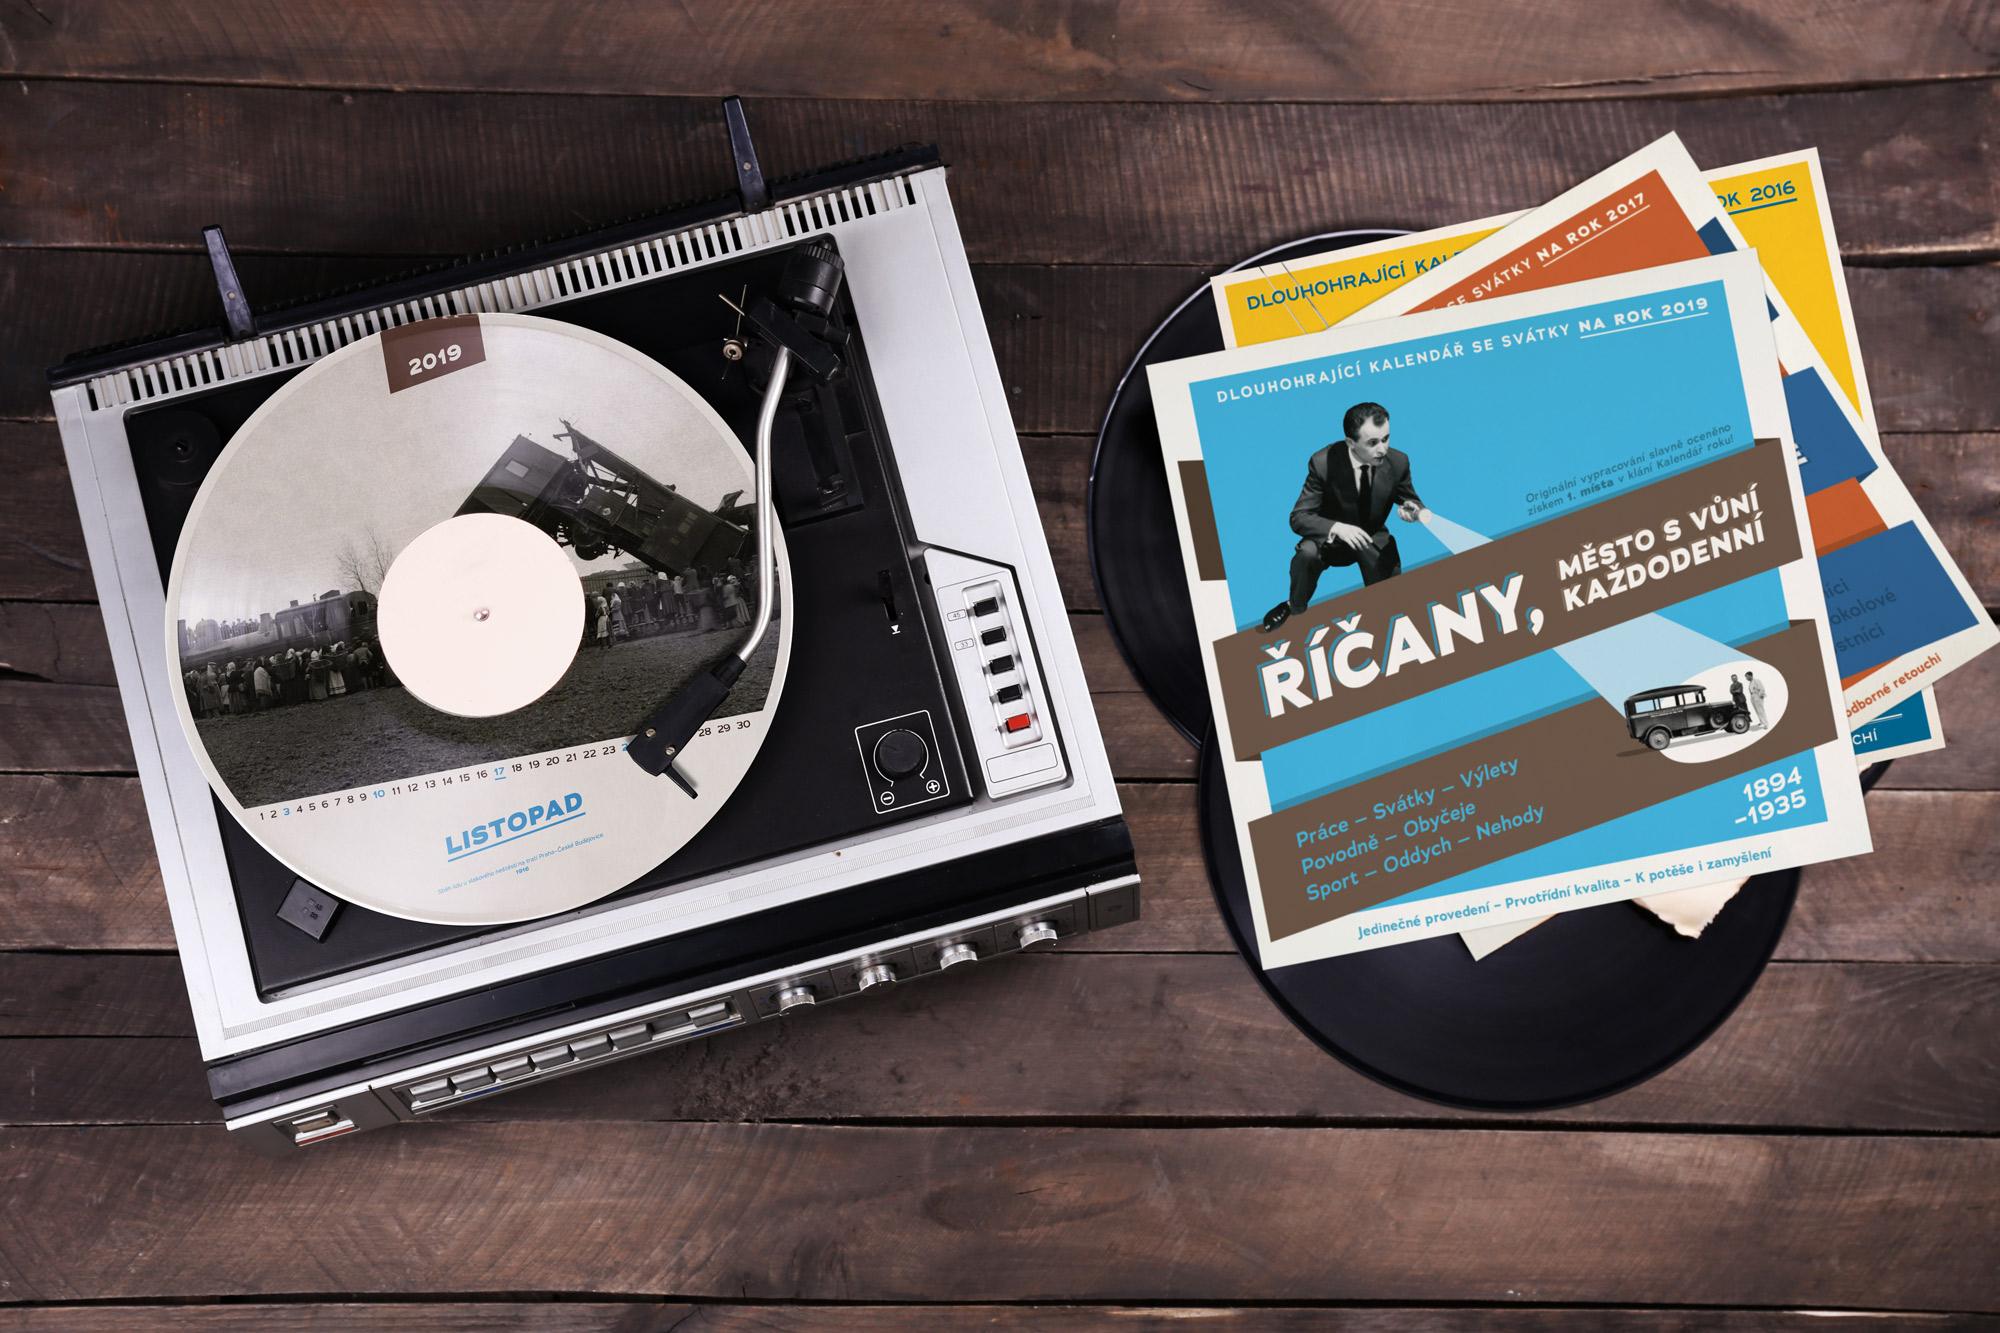 [album/Products_Model_Product/91/Kalendar_Ricany.jpg]